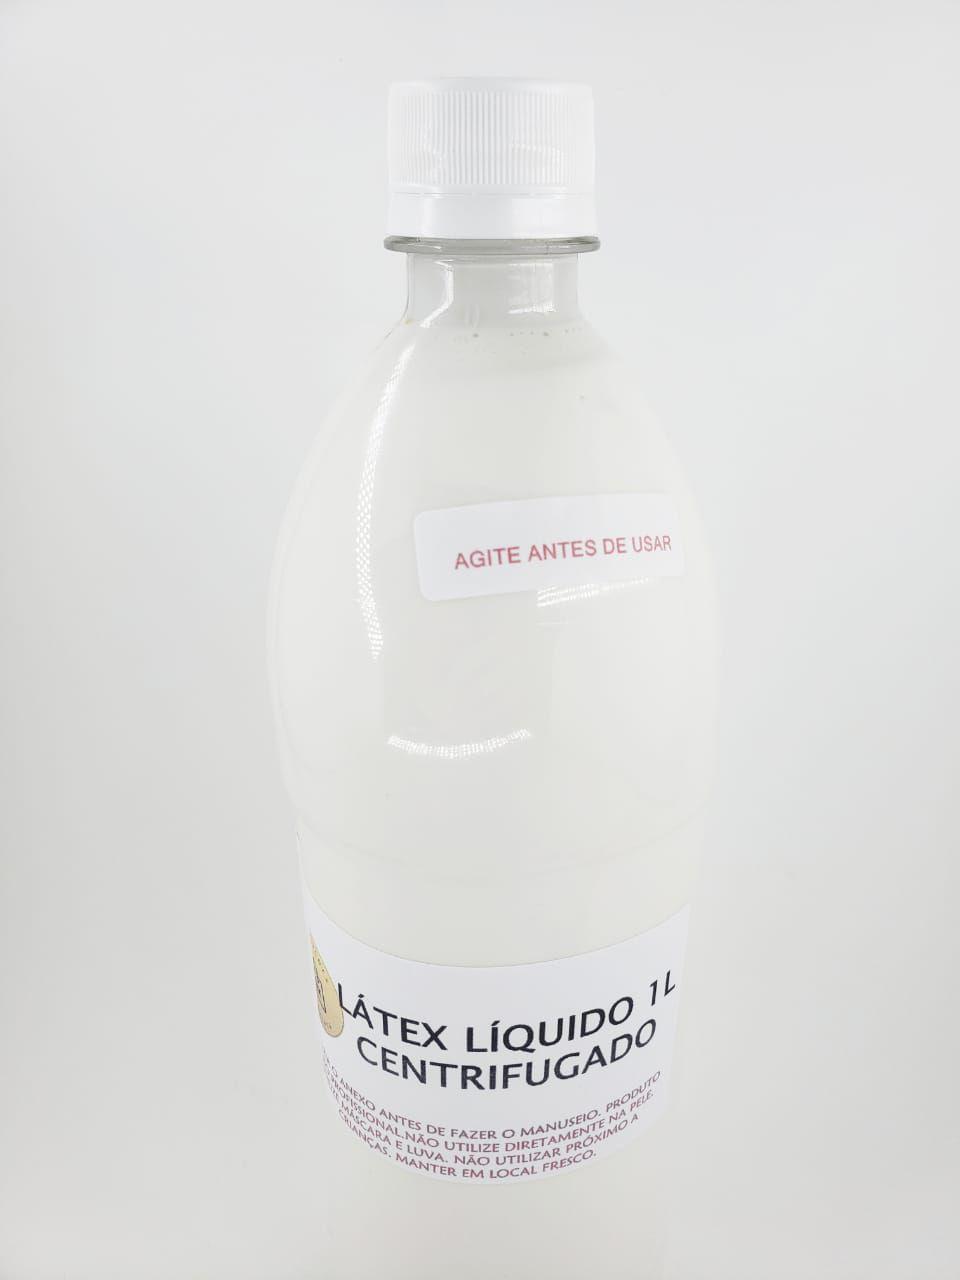 Latex teatral maquiagem artistica 1 litro